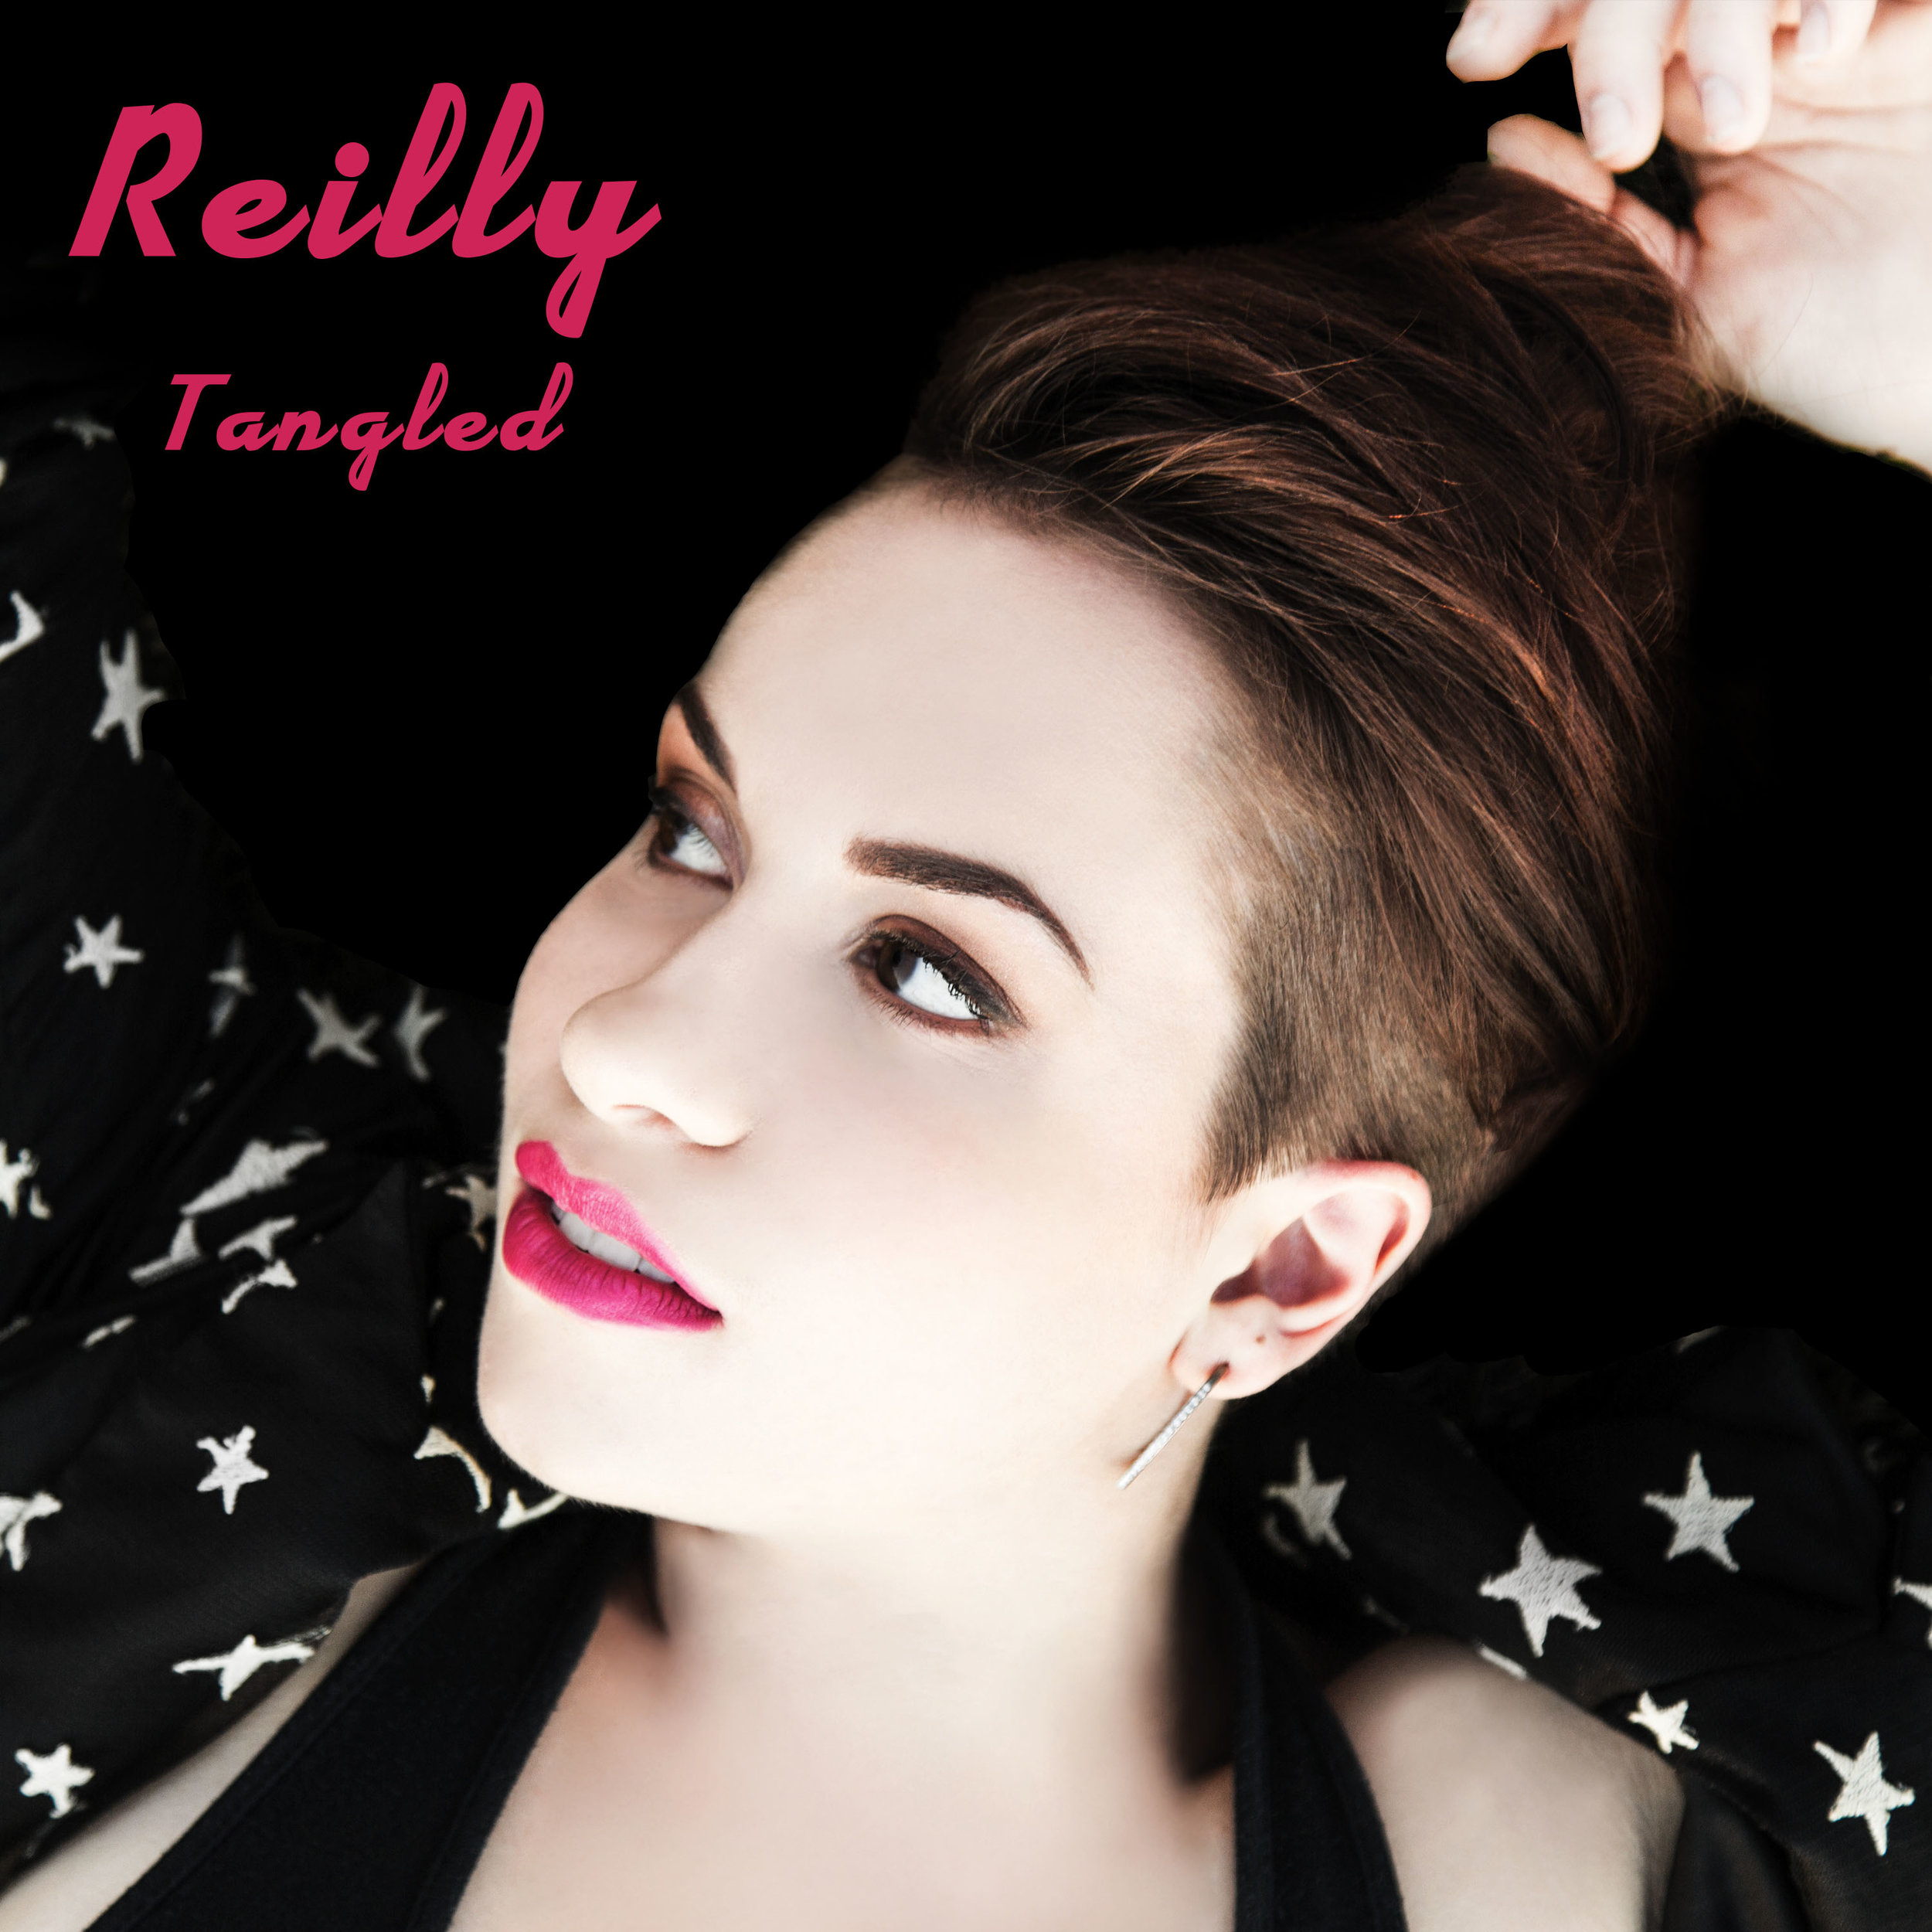 Tangled single.jpg